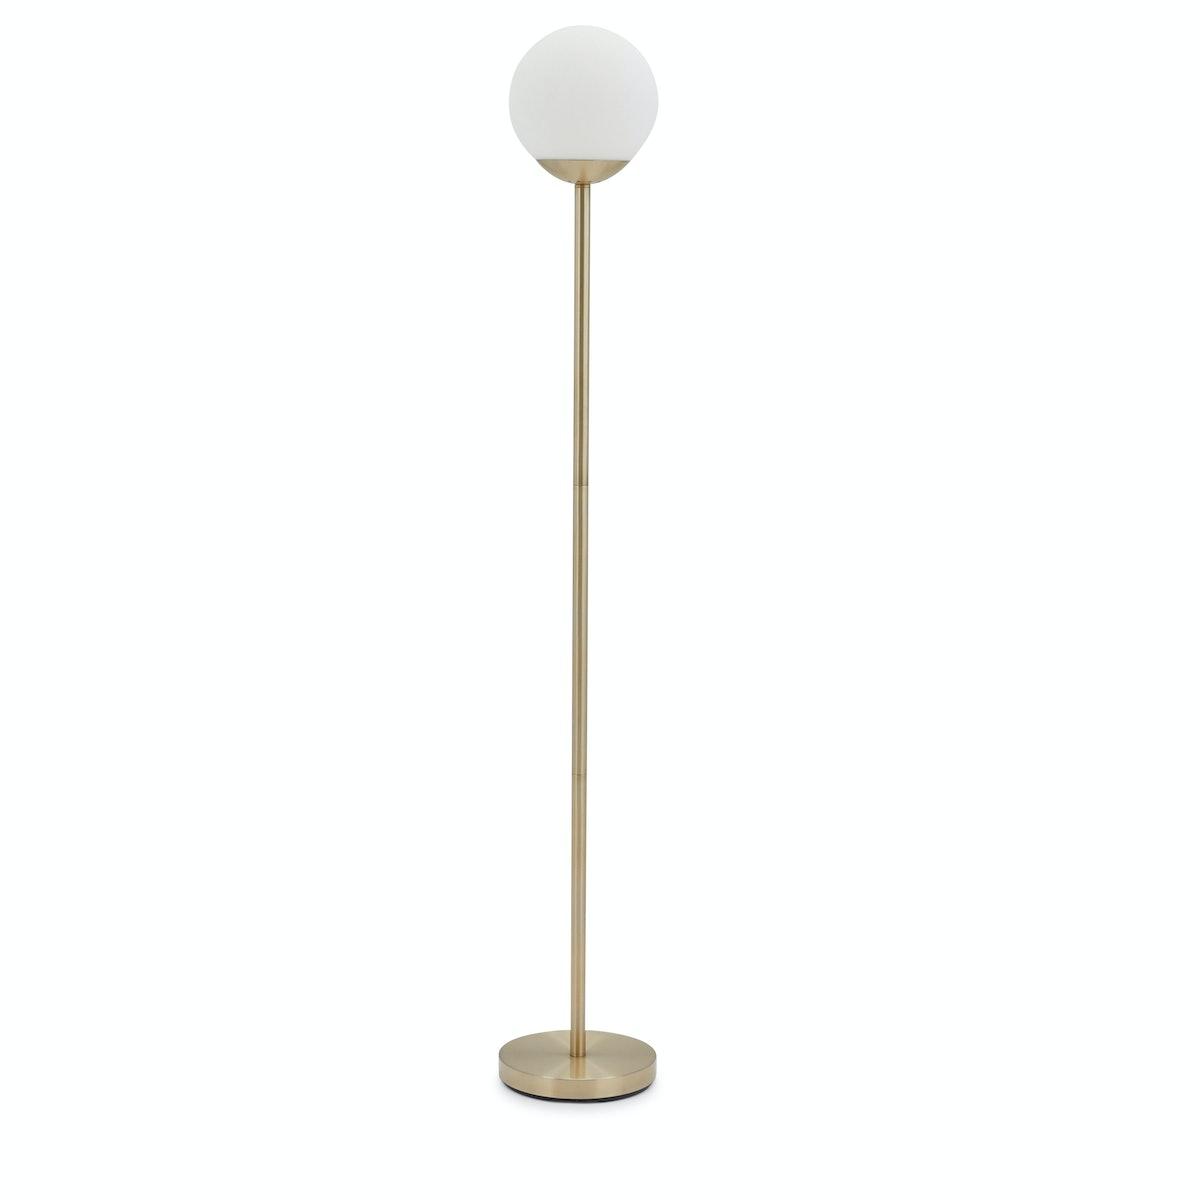 MoDRN Neo Luxury Globe Floor Lamp